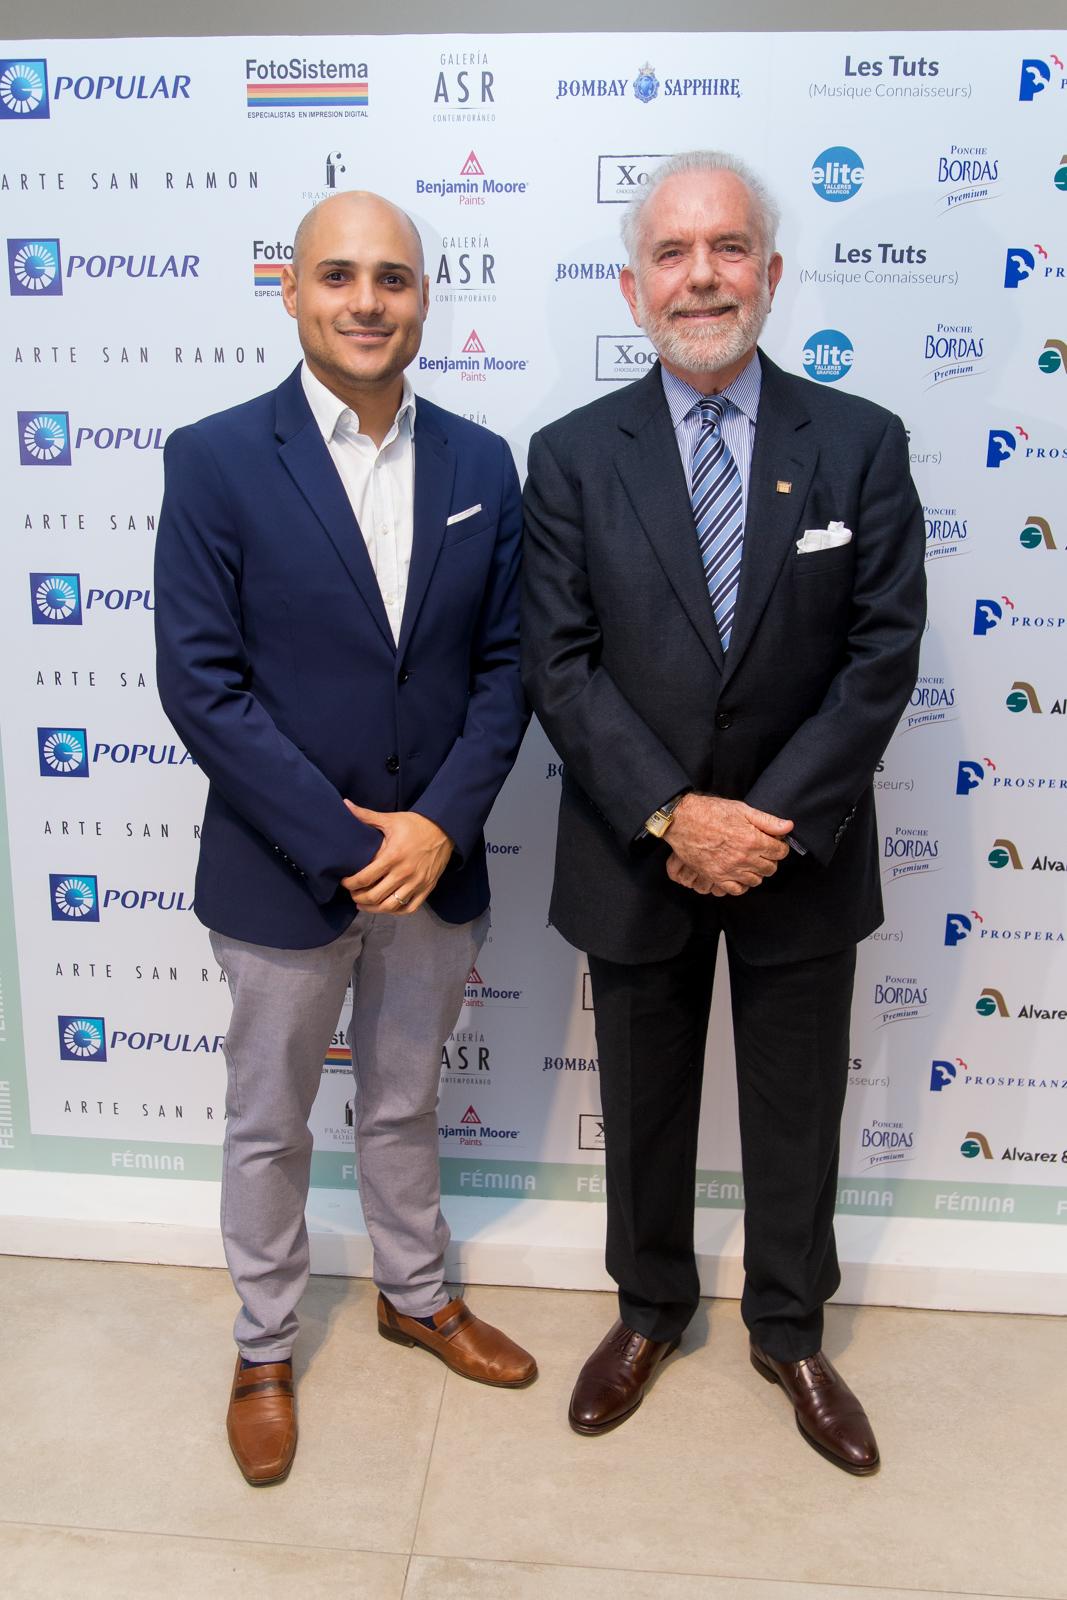 5. Alex Martínez Suárez & George Manuel Hazoury